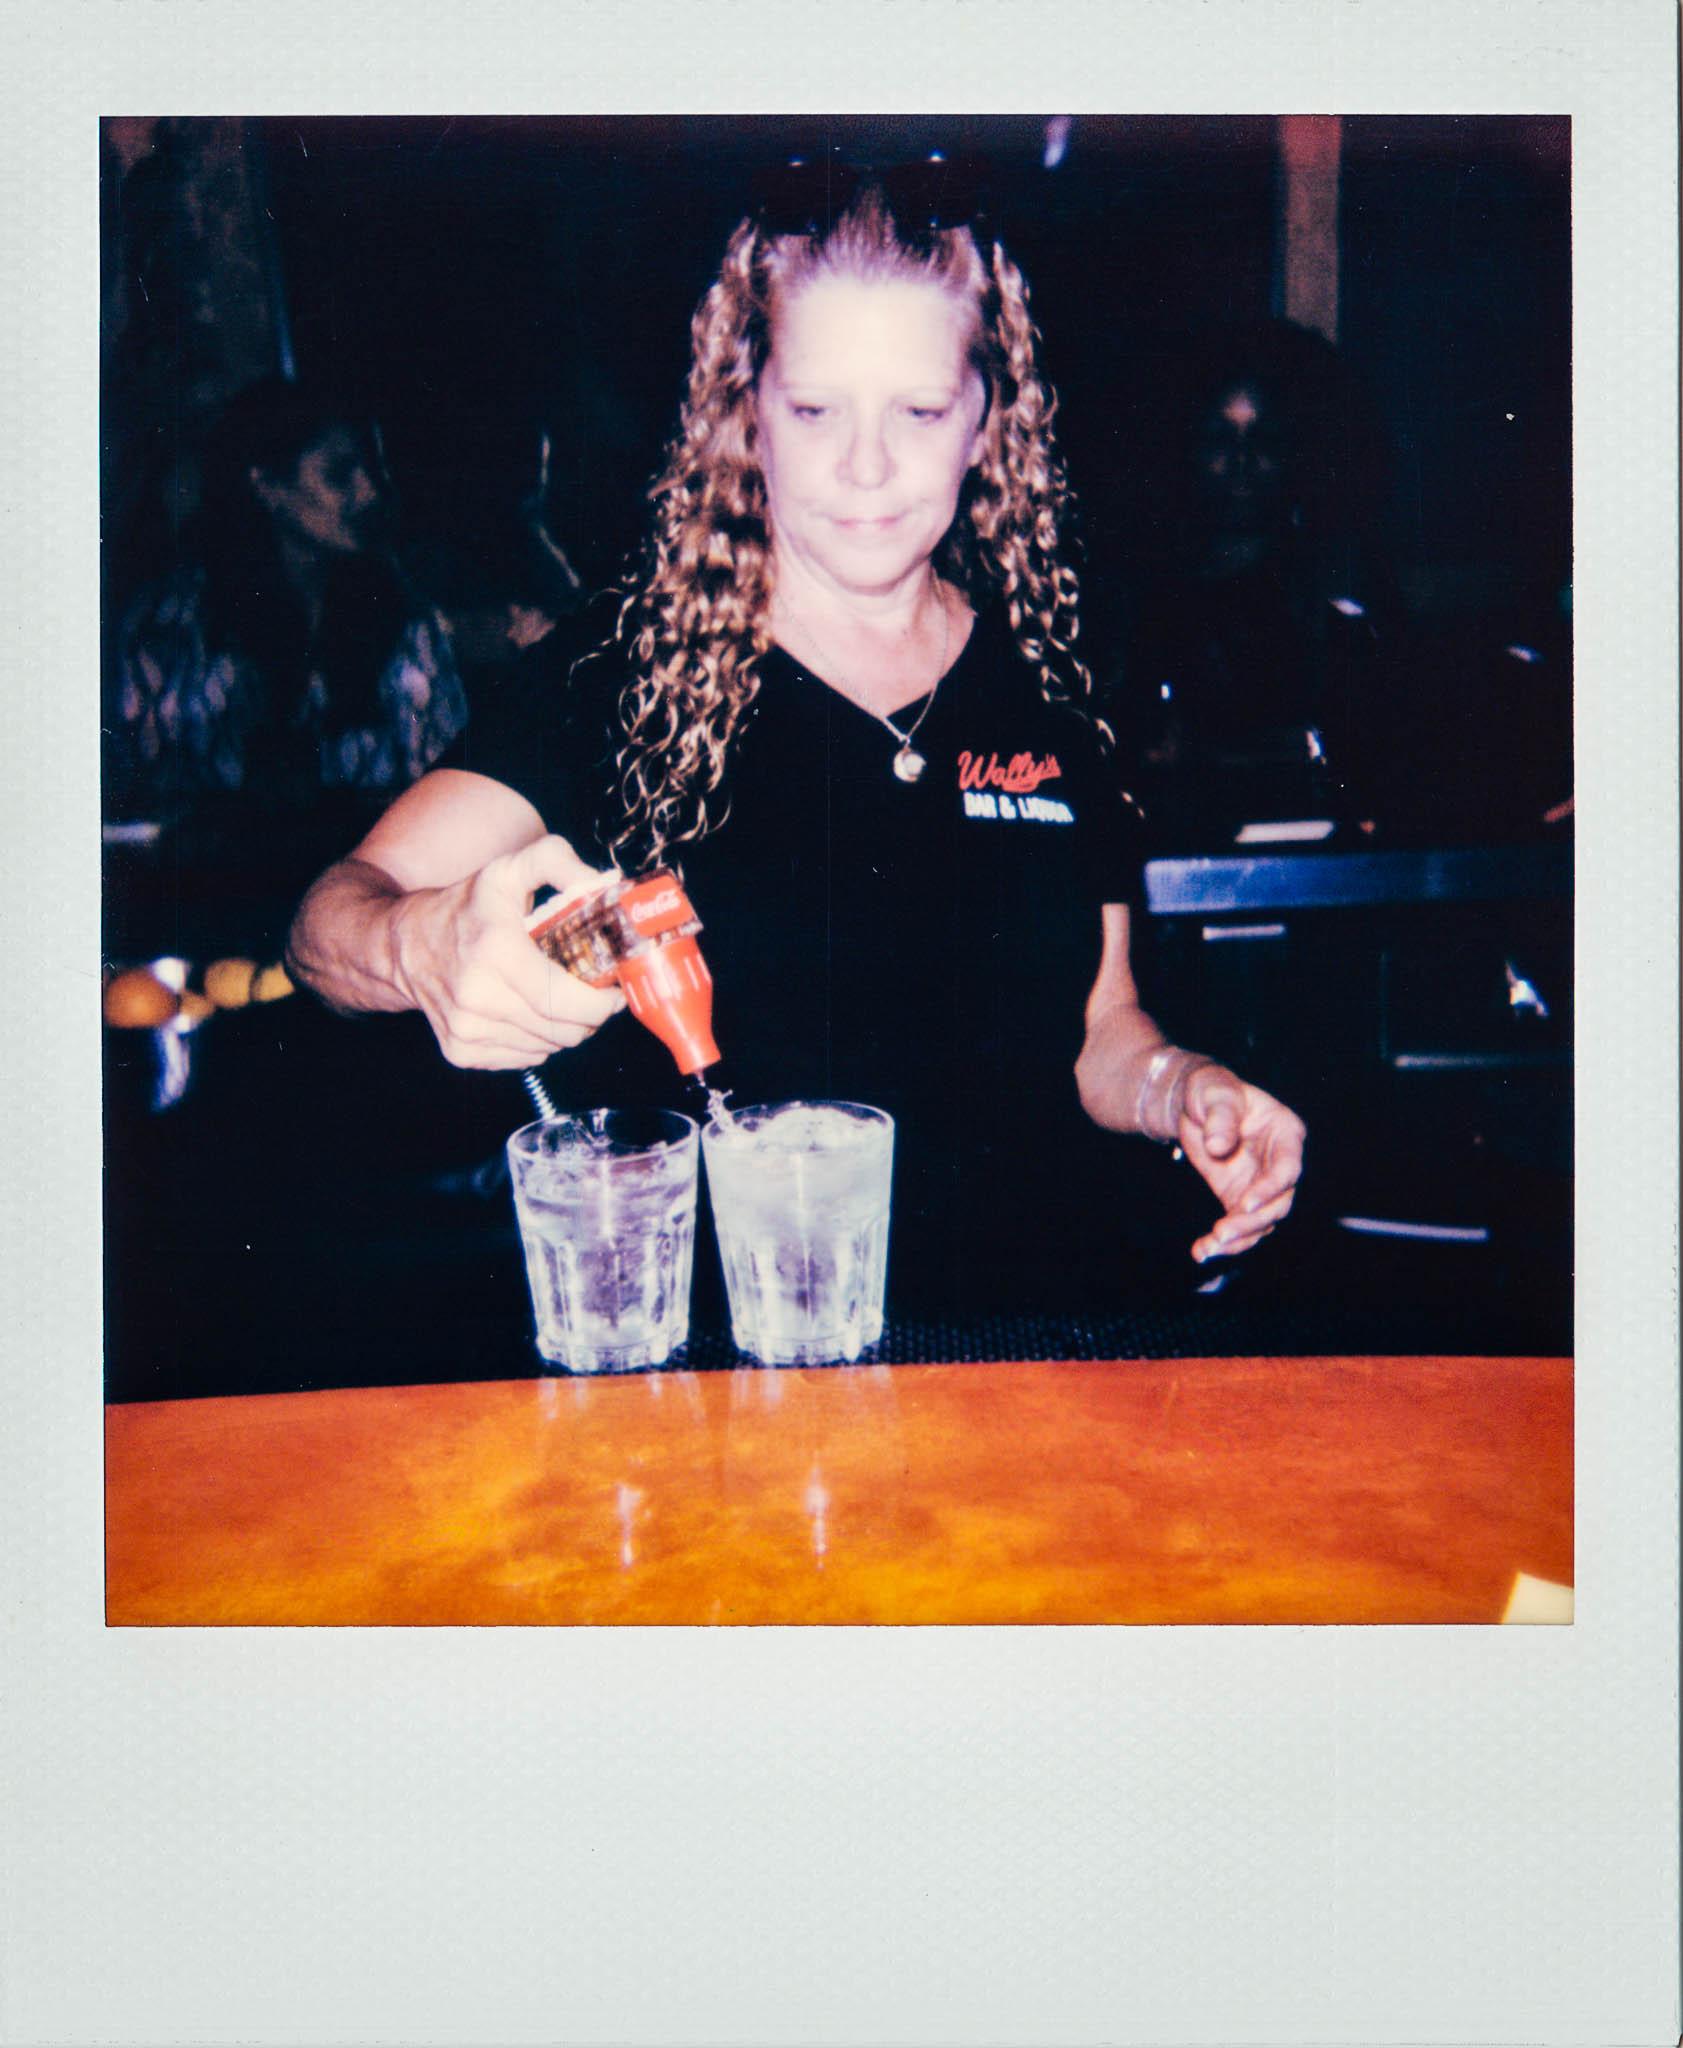 Female bartender making drinks at Wallys Mills Avenue Bar